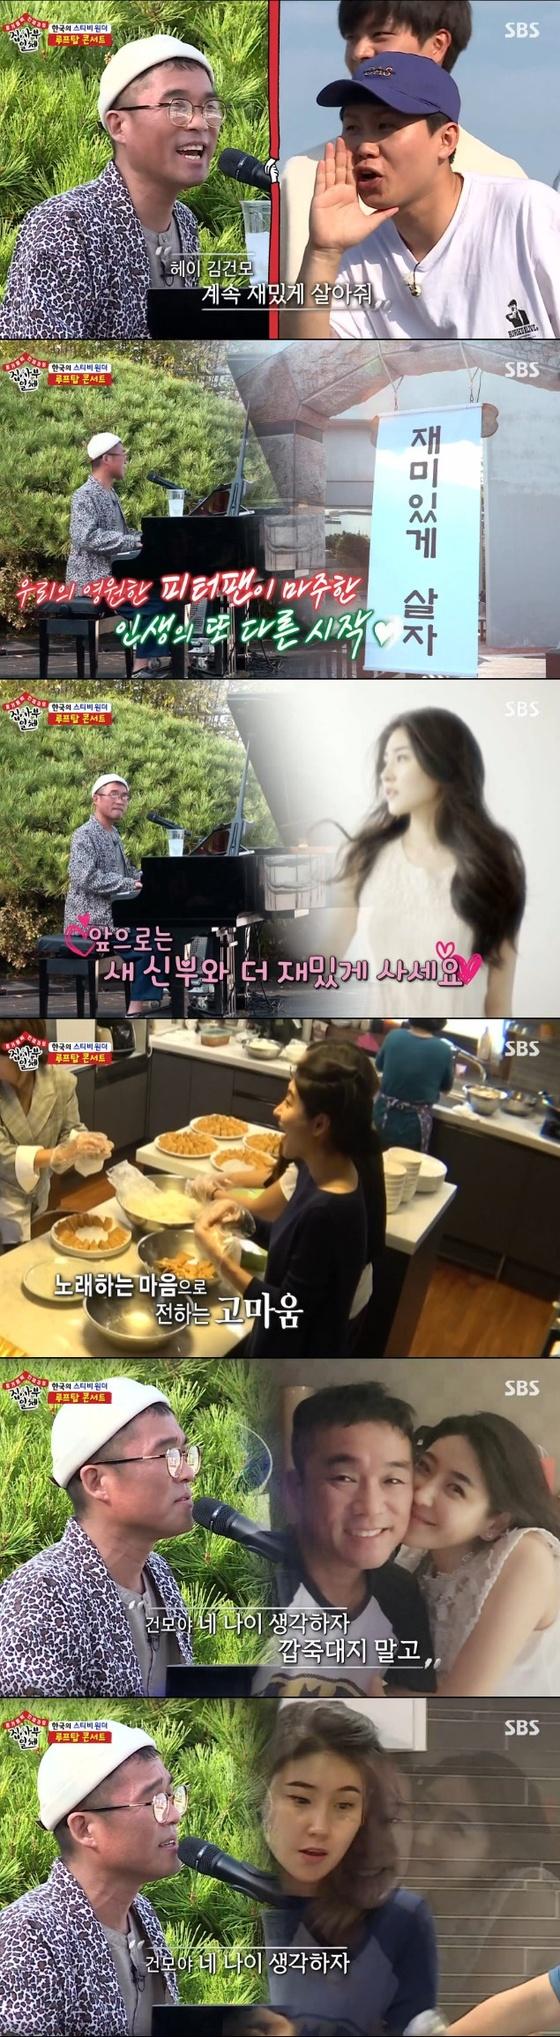 [RE:TV] '집사부일체' 이제야 보이는 김건모♥장지연 '하트시그널'